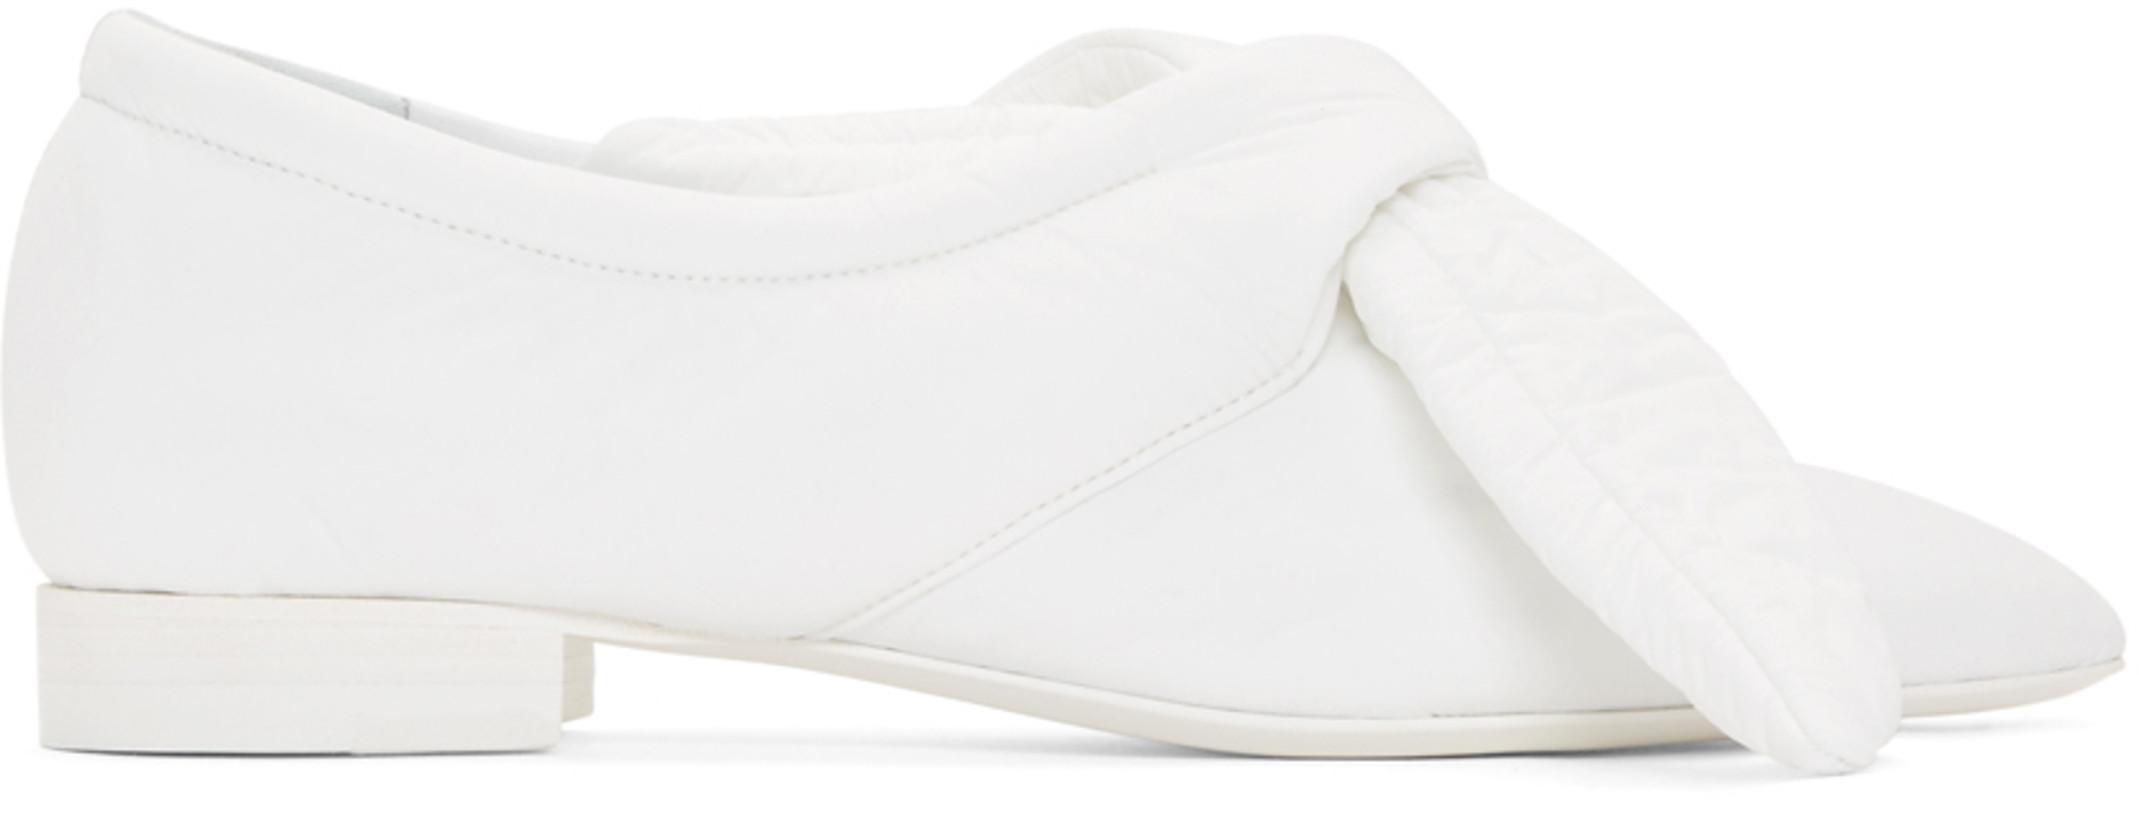 Jil Sander White Knot Pointy Ballerina Flats